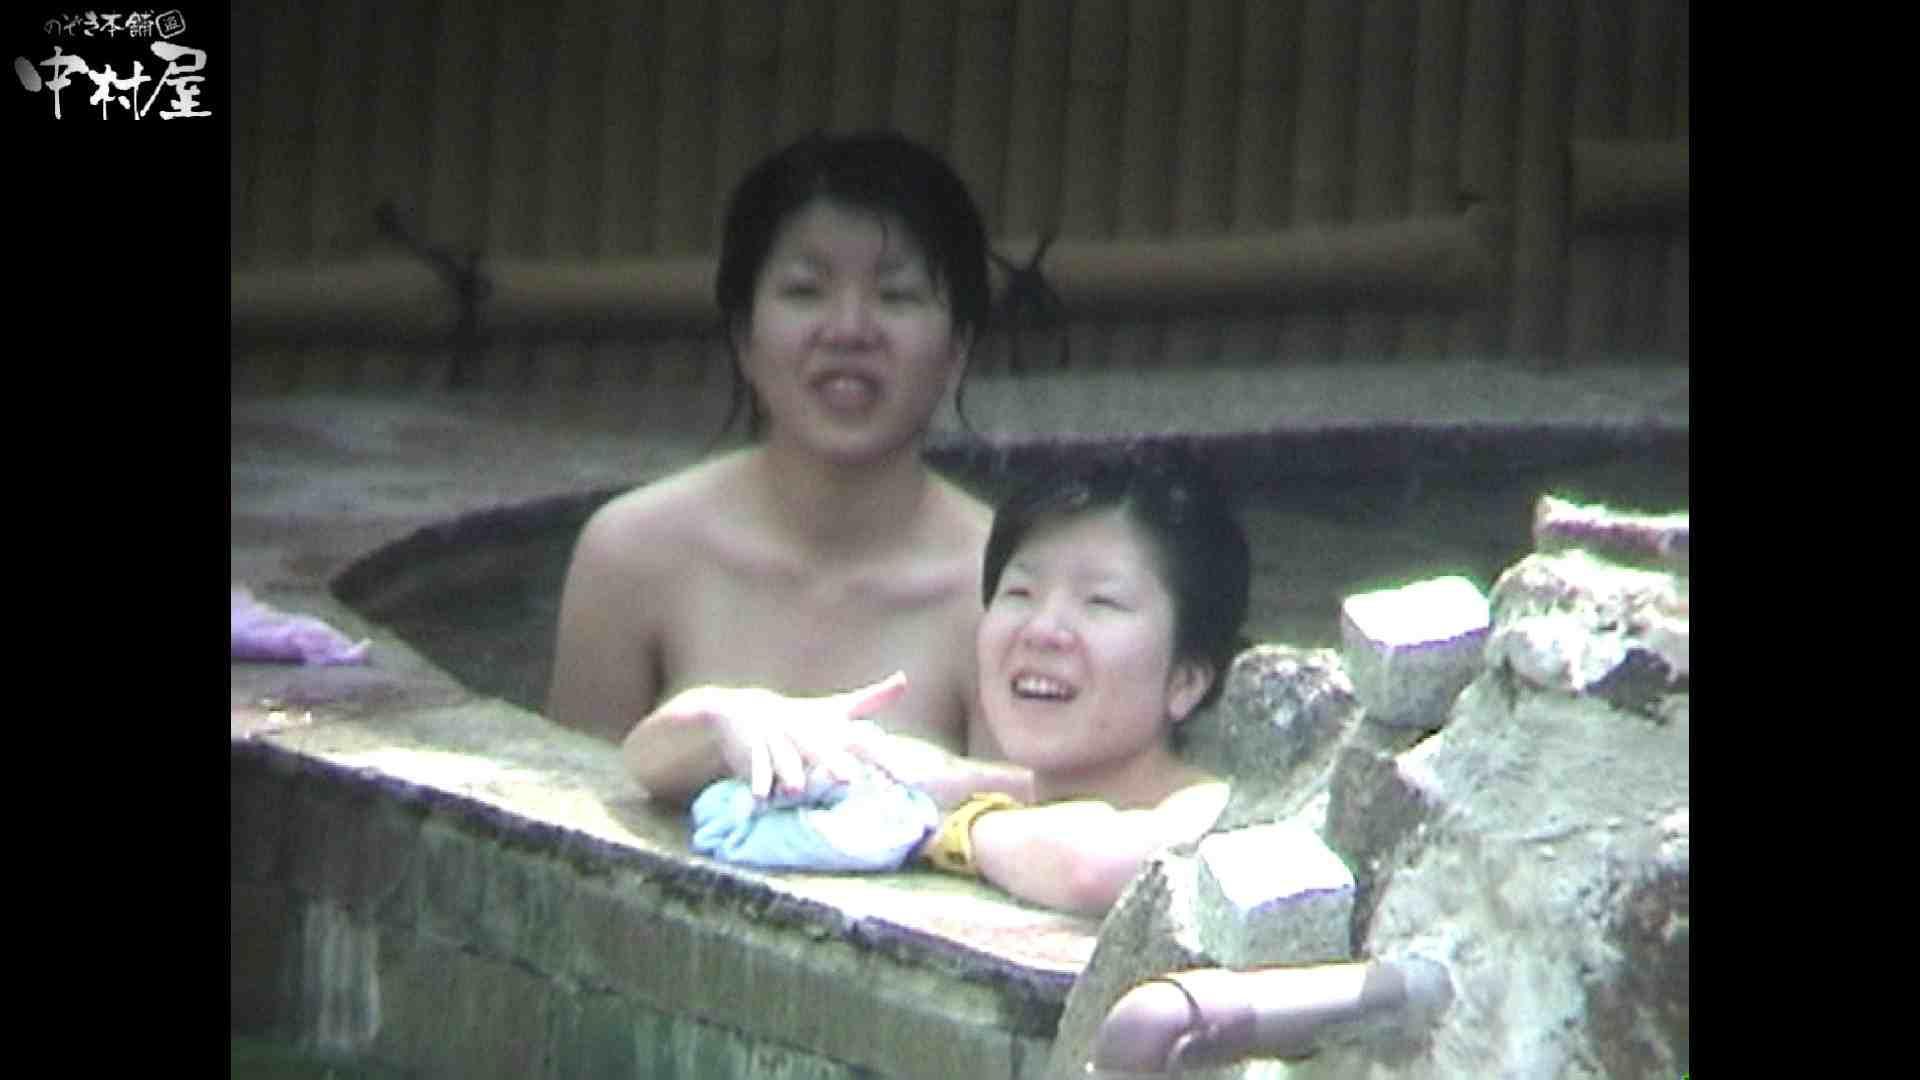 Aquaな露天風呂Vol.936 盗撮特撮 | OLのプライベート  11pic 1